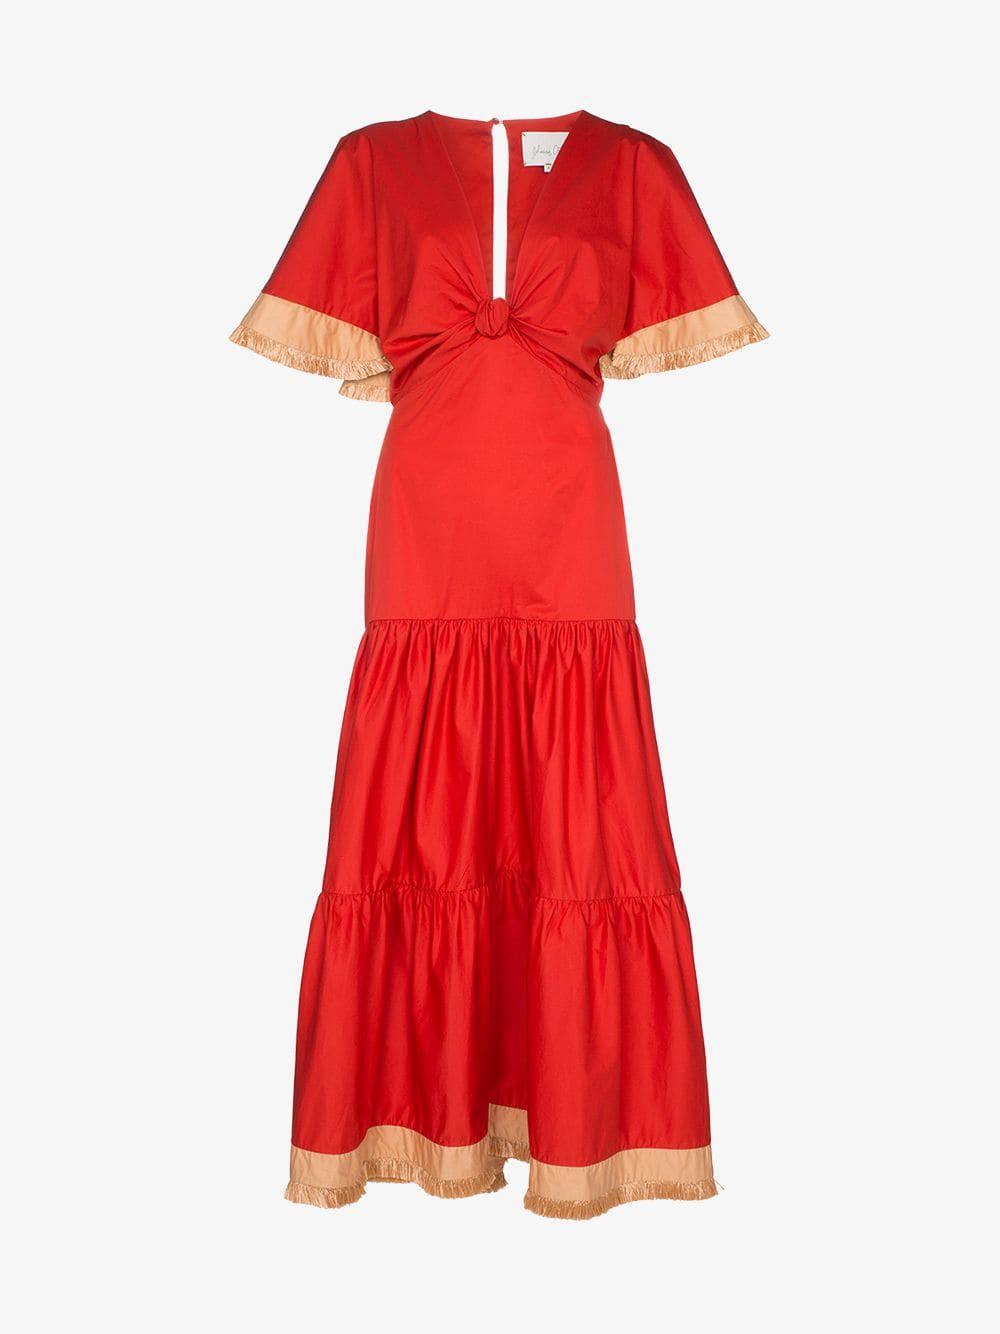 Johanna Ortiz untold stories cotton maxi dress in red